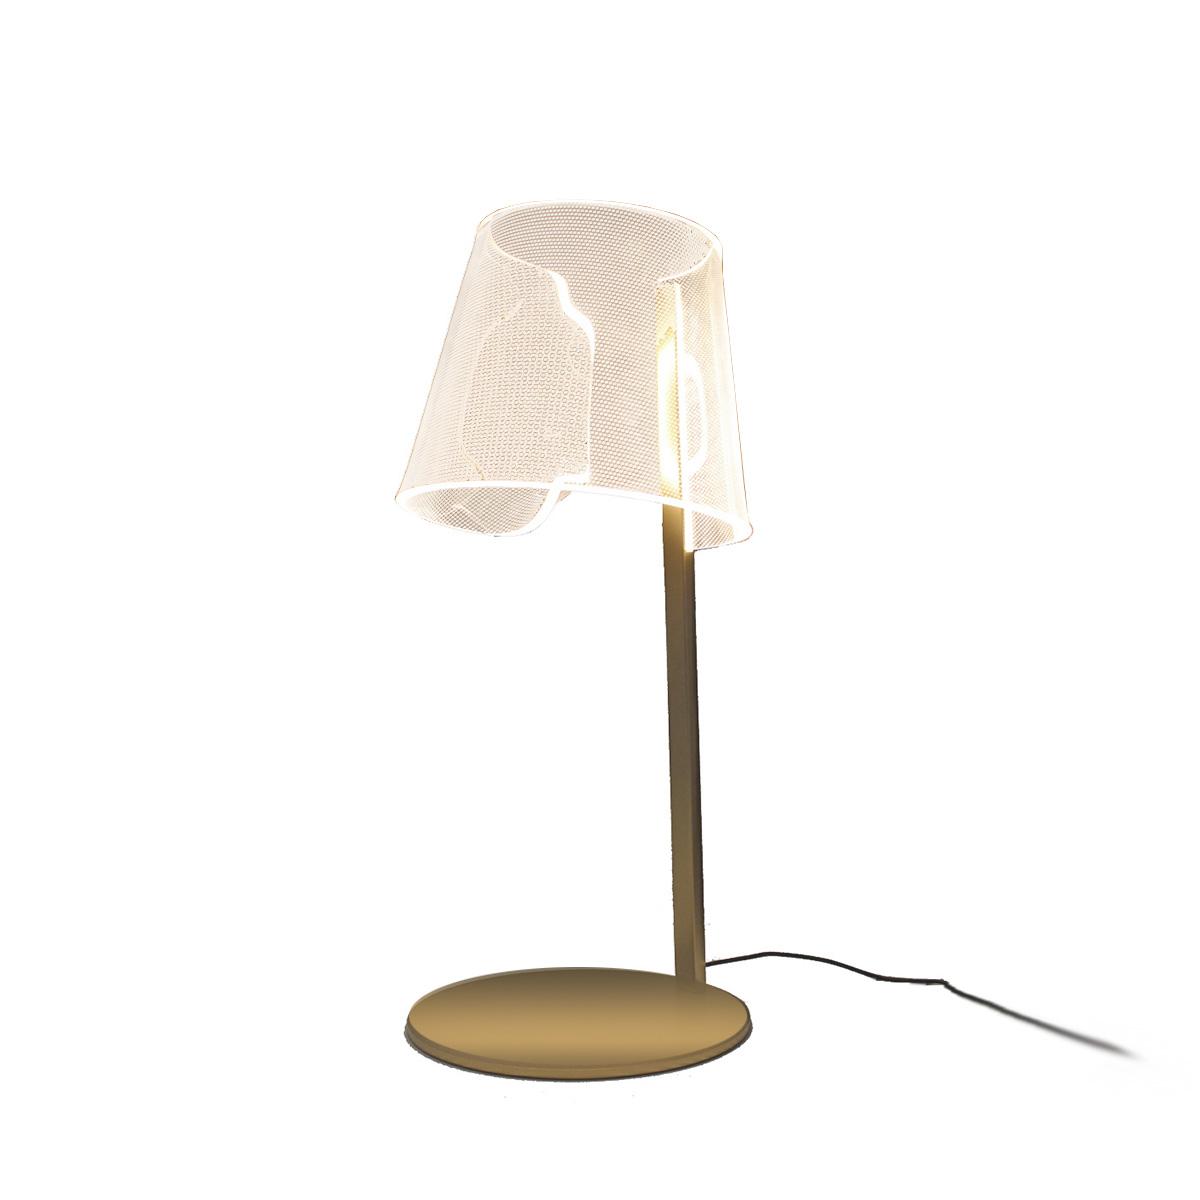 Led stona lampa 1.0025